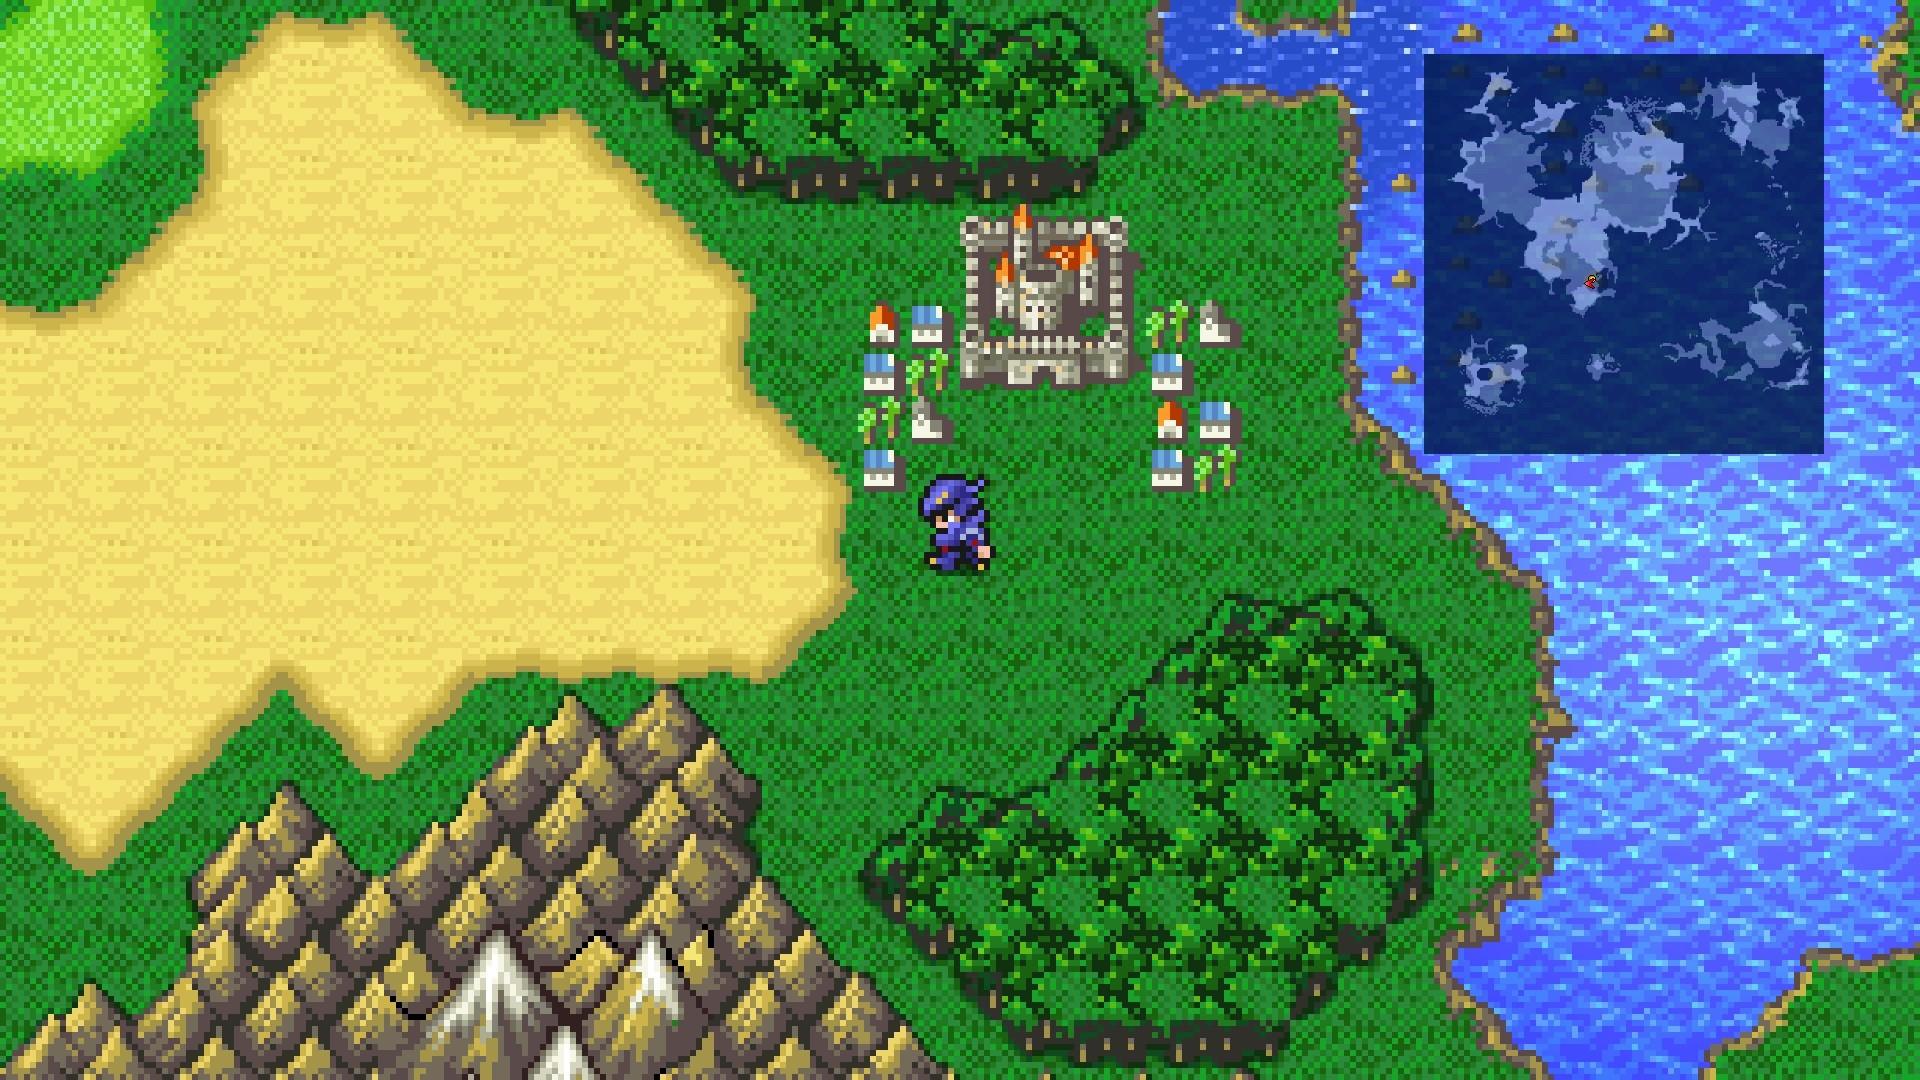 Final Fantasy IV Pixel Remaster 2582021 2